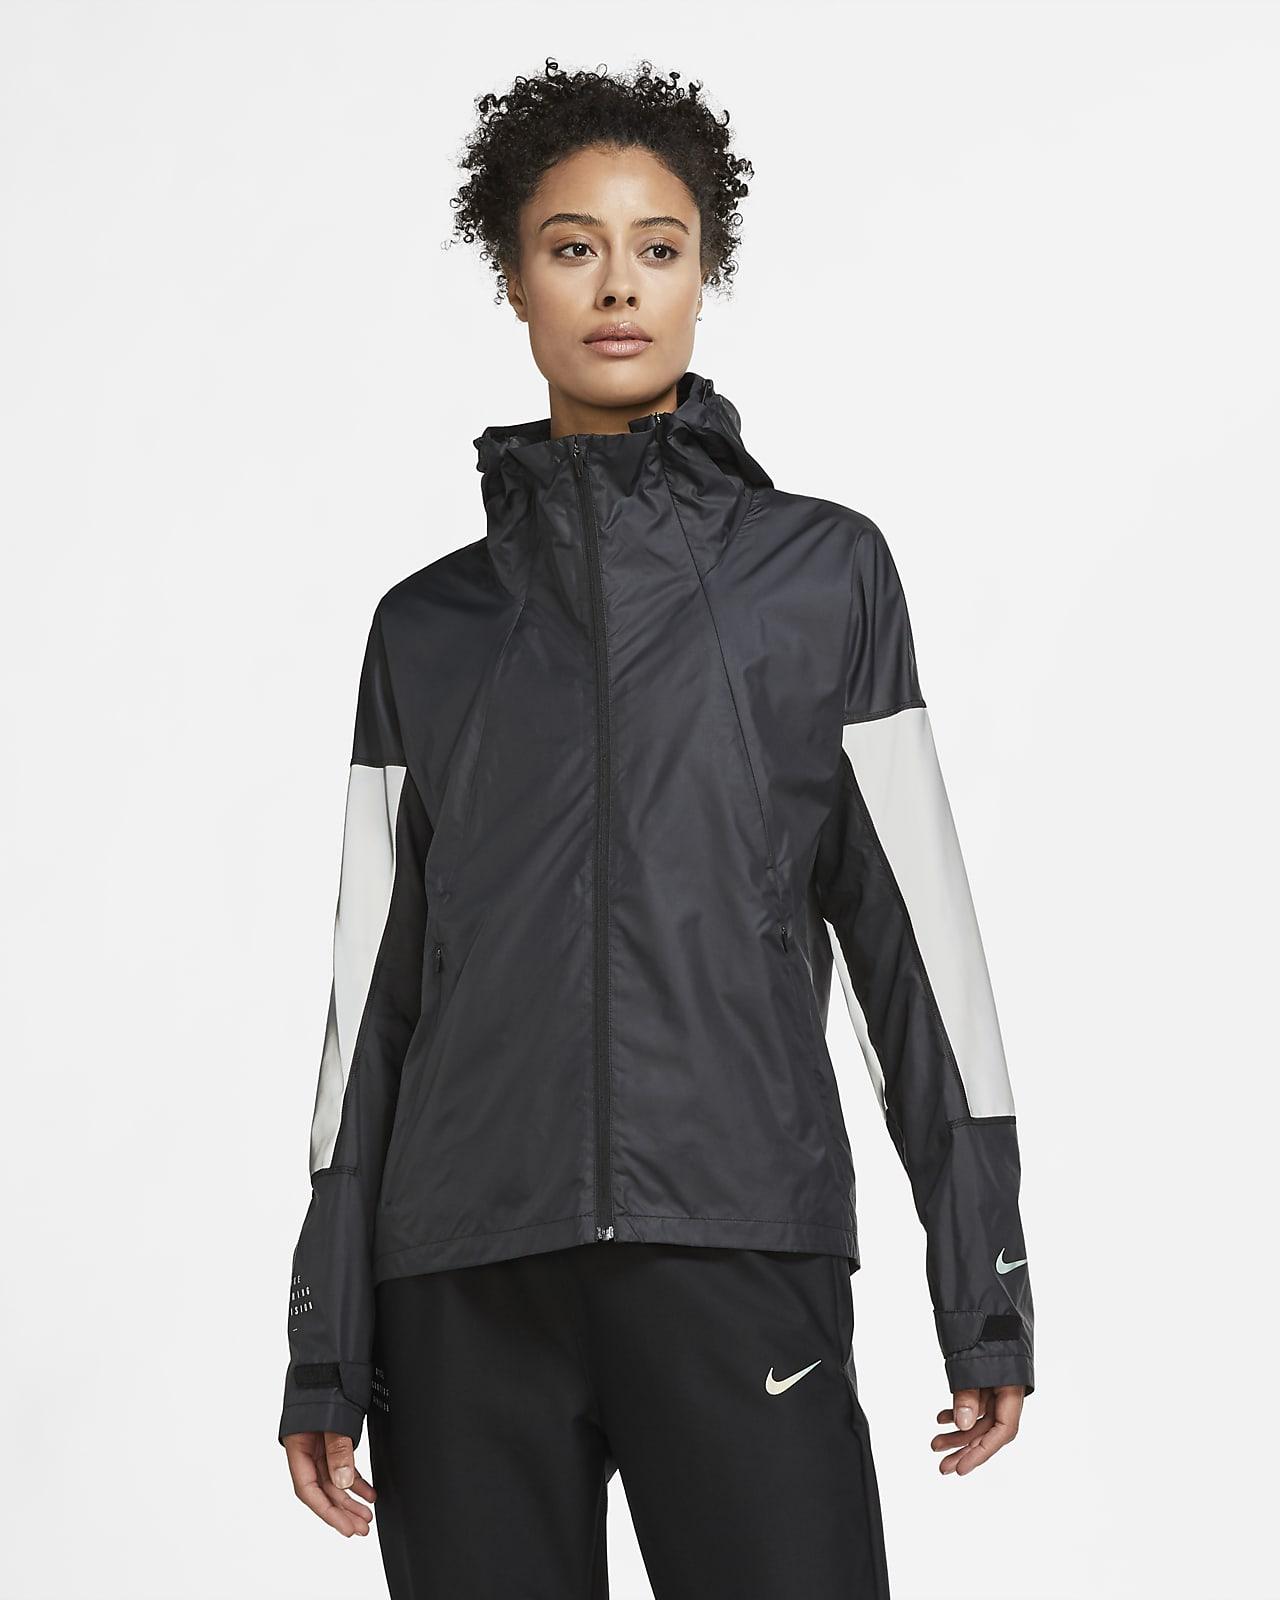 Nike Run Division Flash Chaqueta de running - Mujer